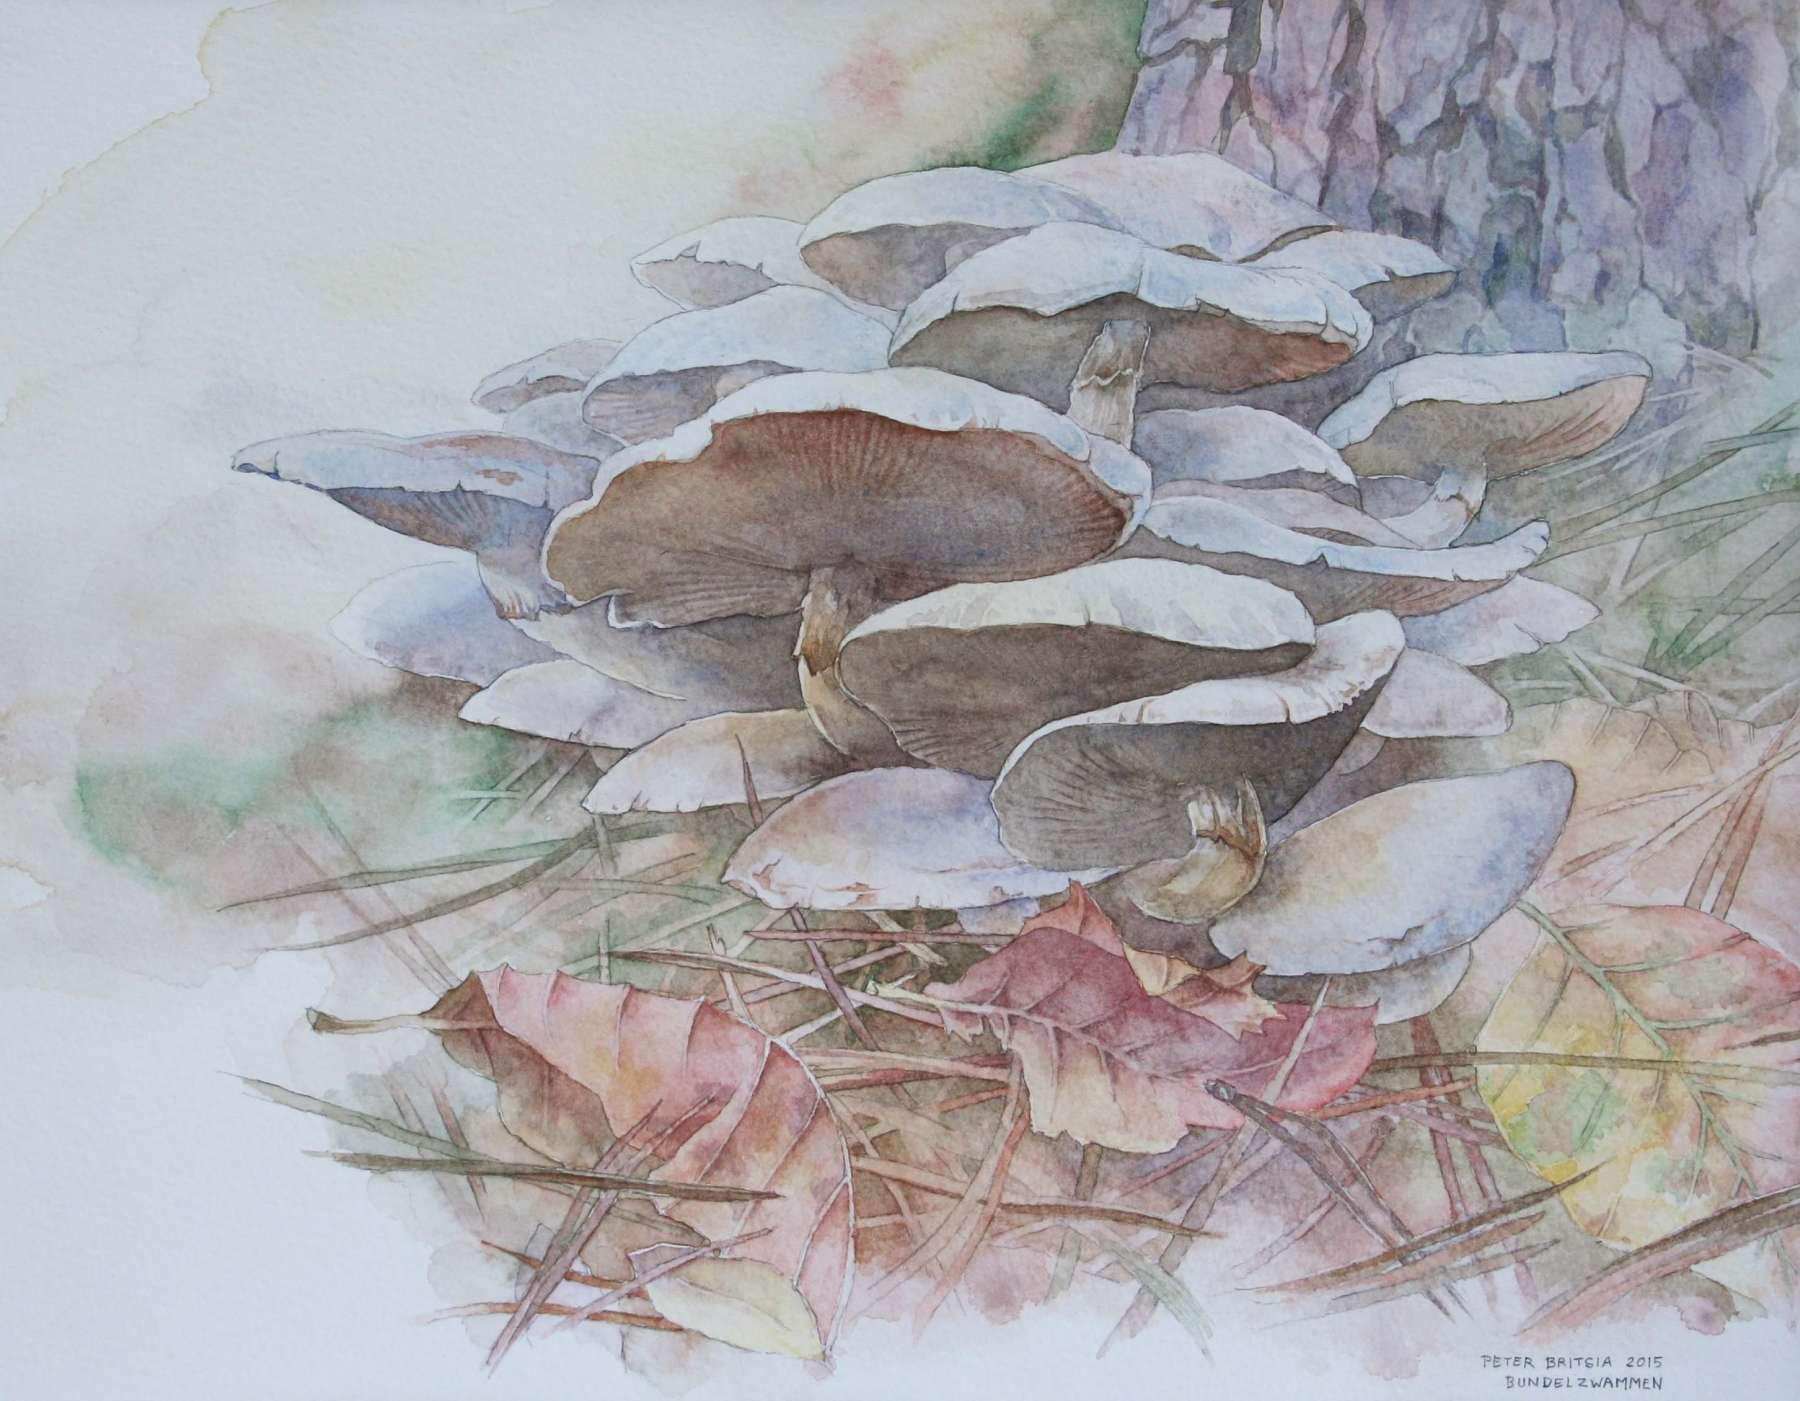 Bleekgele bundelzwammen - aquarel 40 x 30 cm.